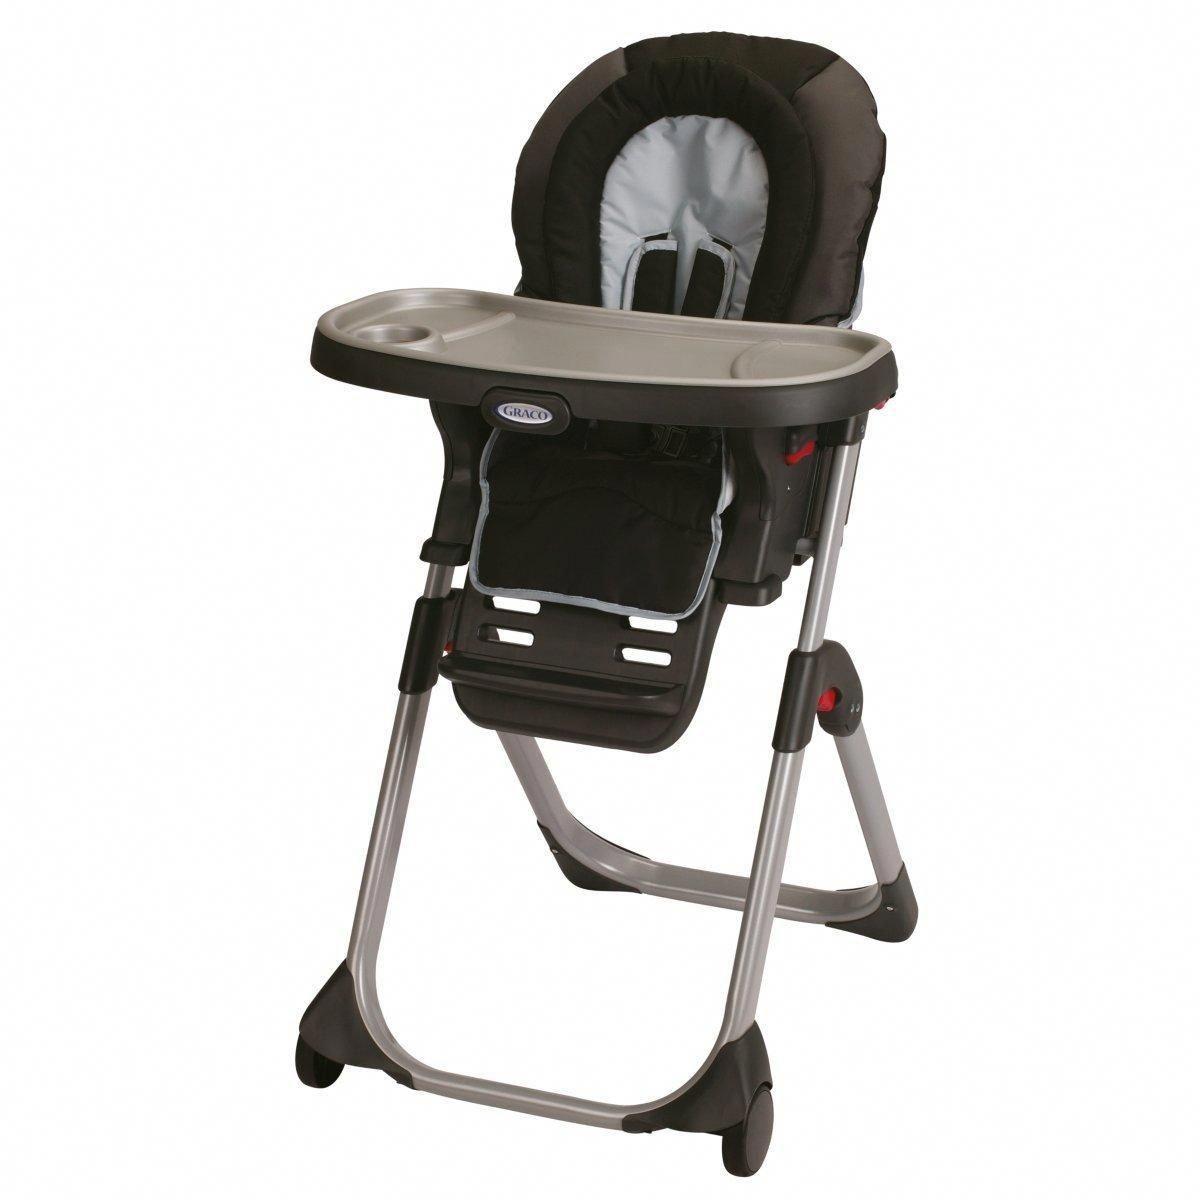 graco slim spaces high chair office new design amazon com highchair manor baby showerchairamazon